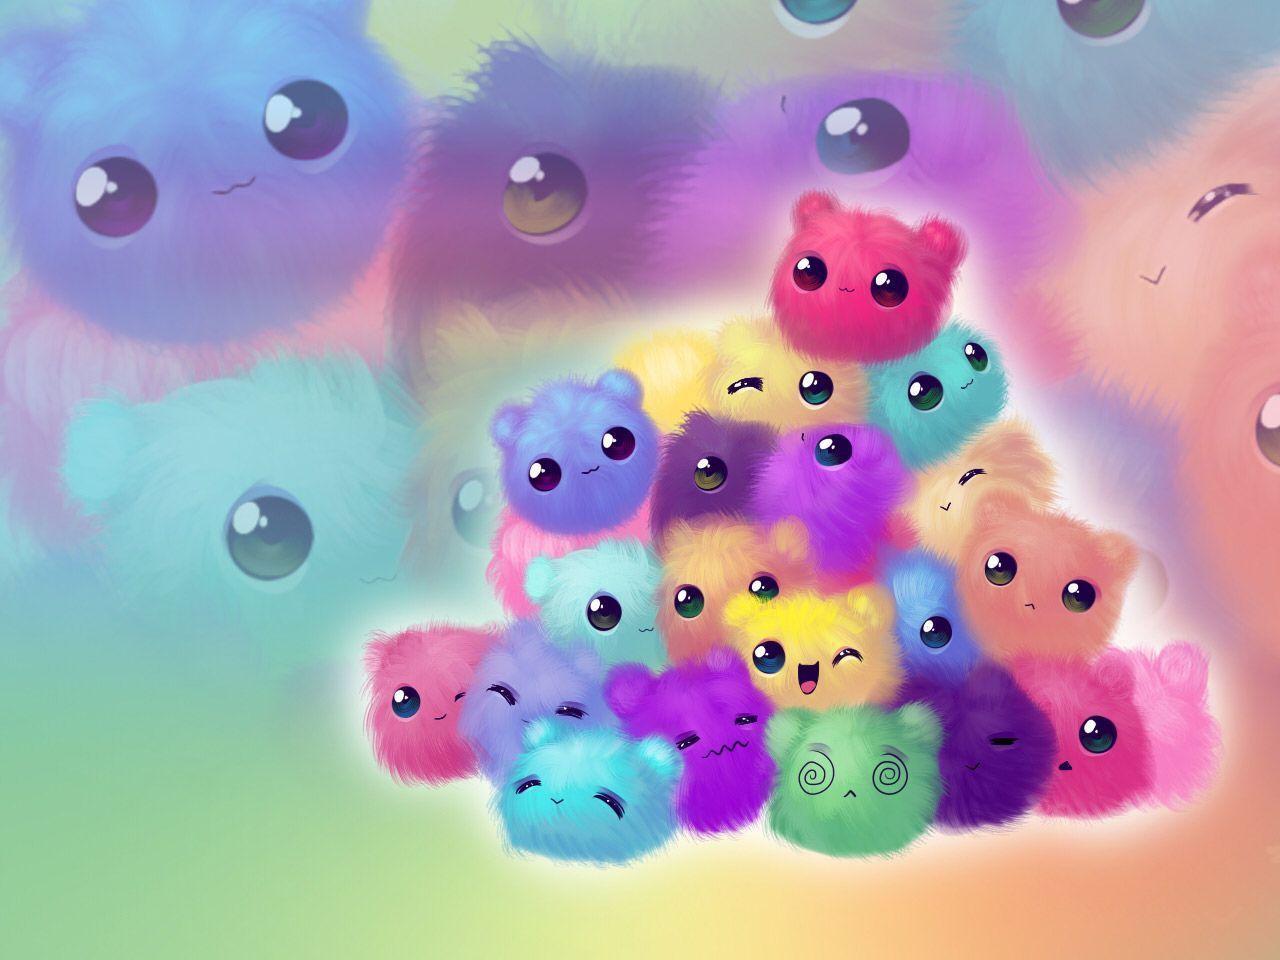 Desktop Backgrounds Cute 1280x960